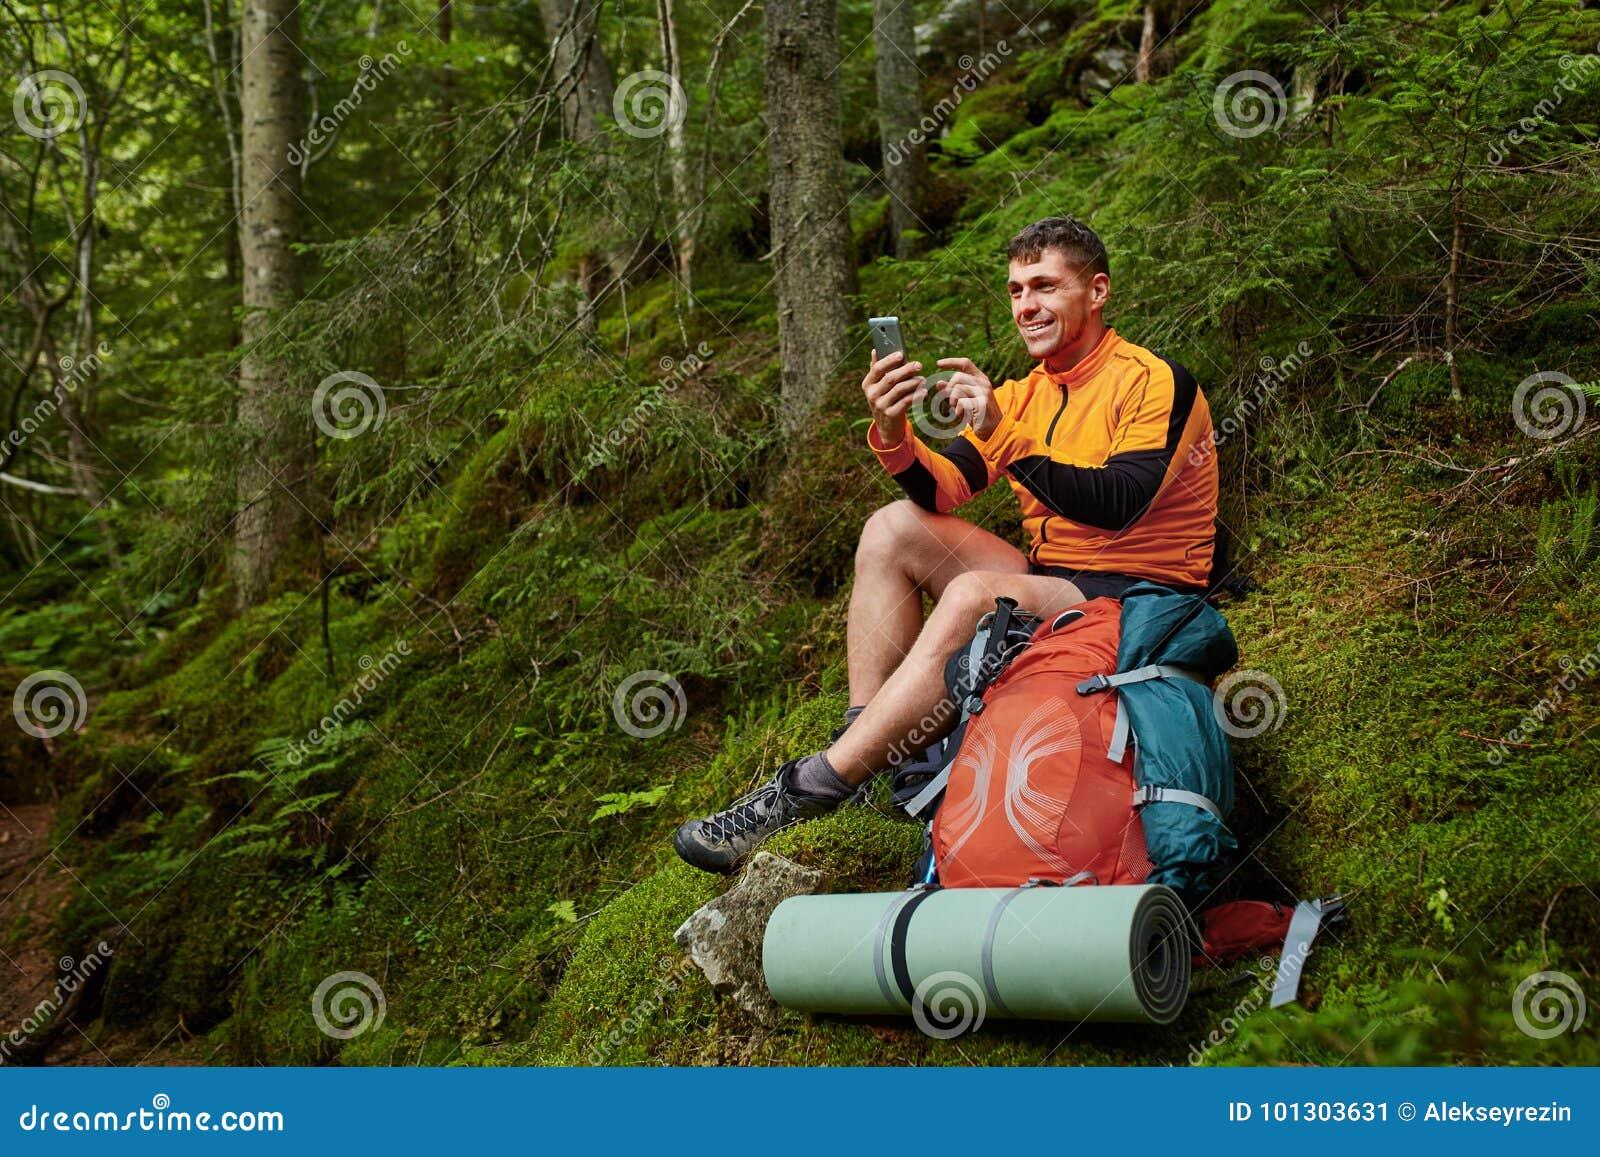 Дама на отдыхе в лесу с молодым человеком — photo 2